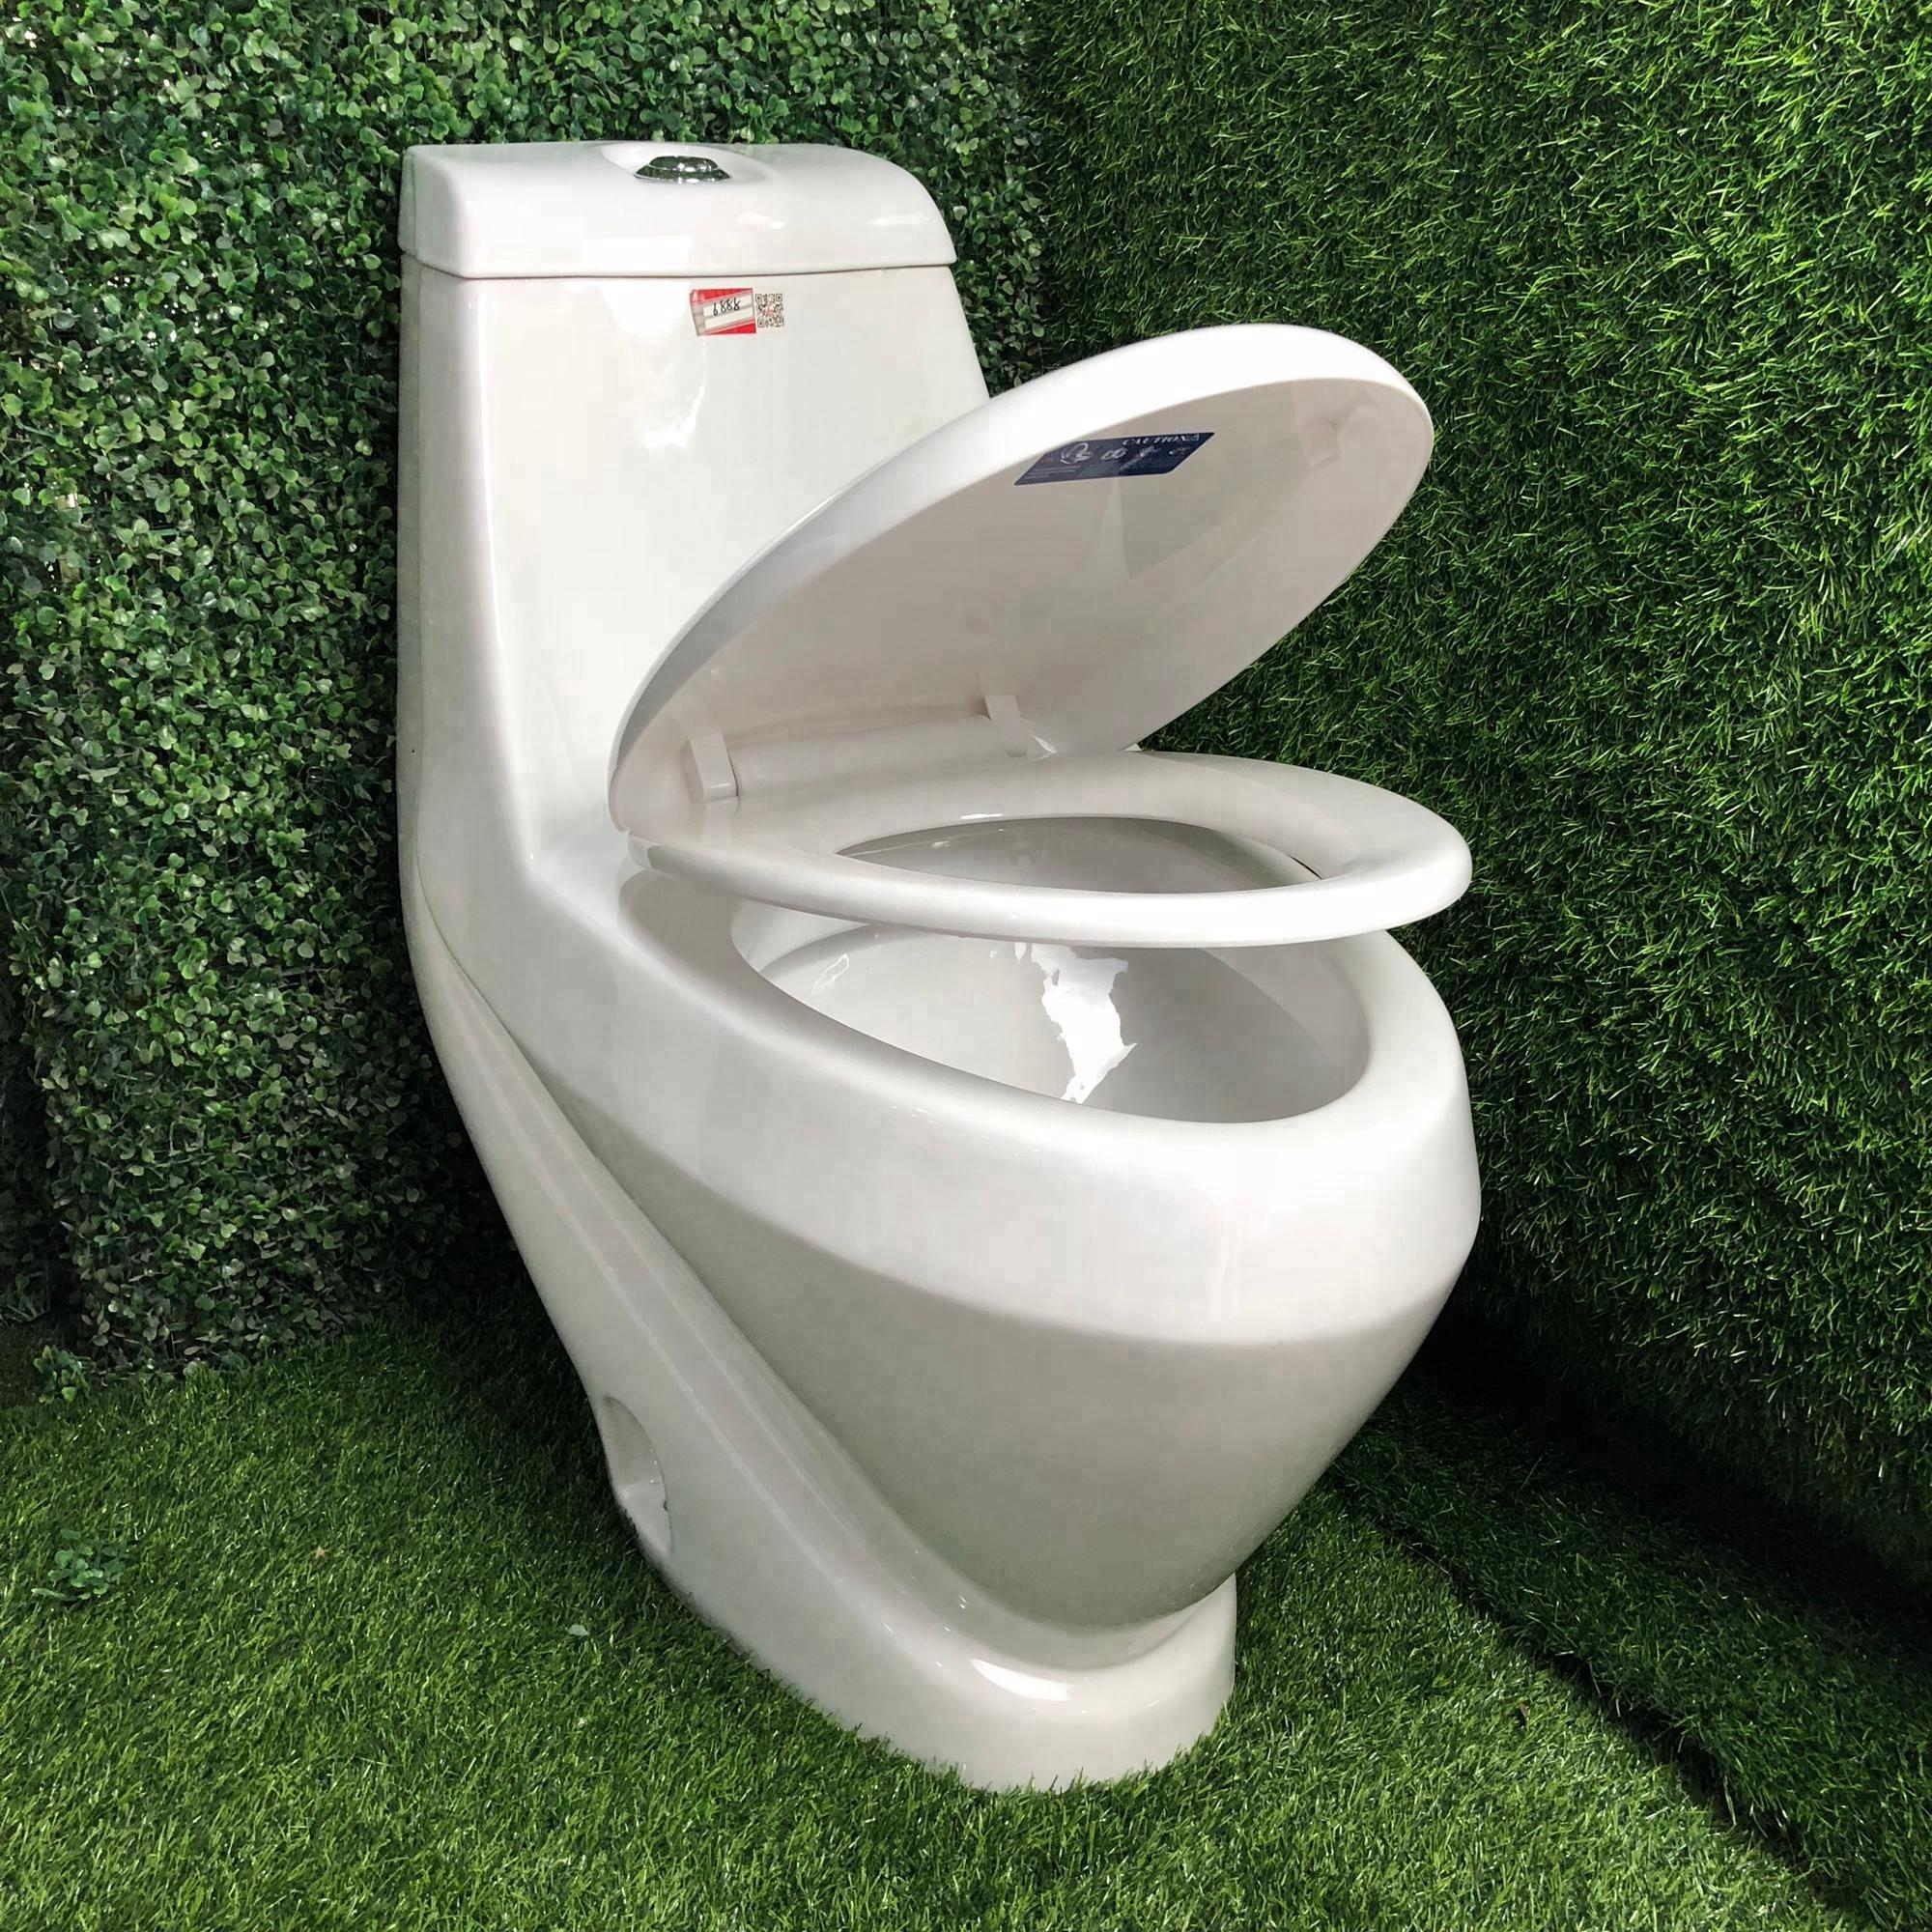 A-6888 cycle Flushing Ceramic toilet, Bathroom Ceramic Sanitary Ware water closet